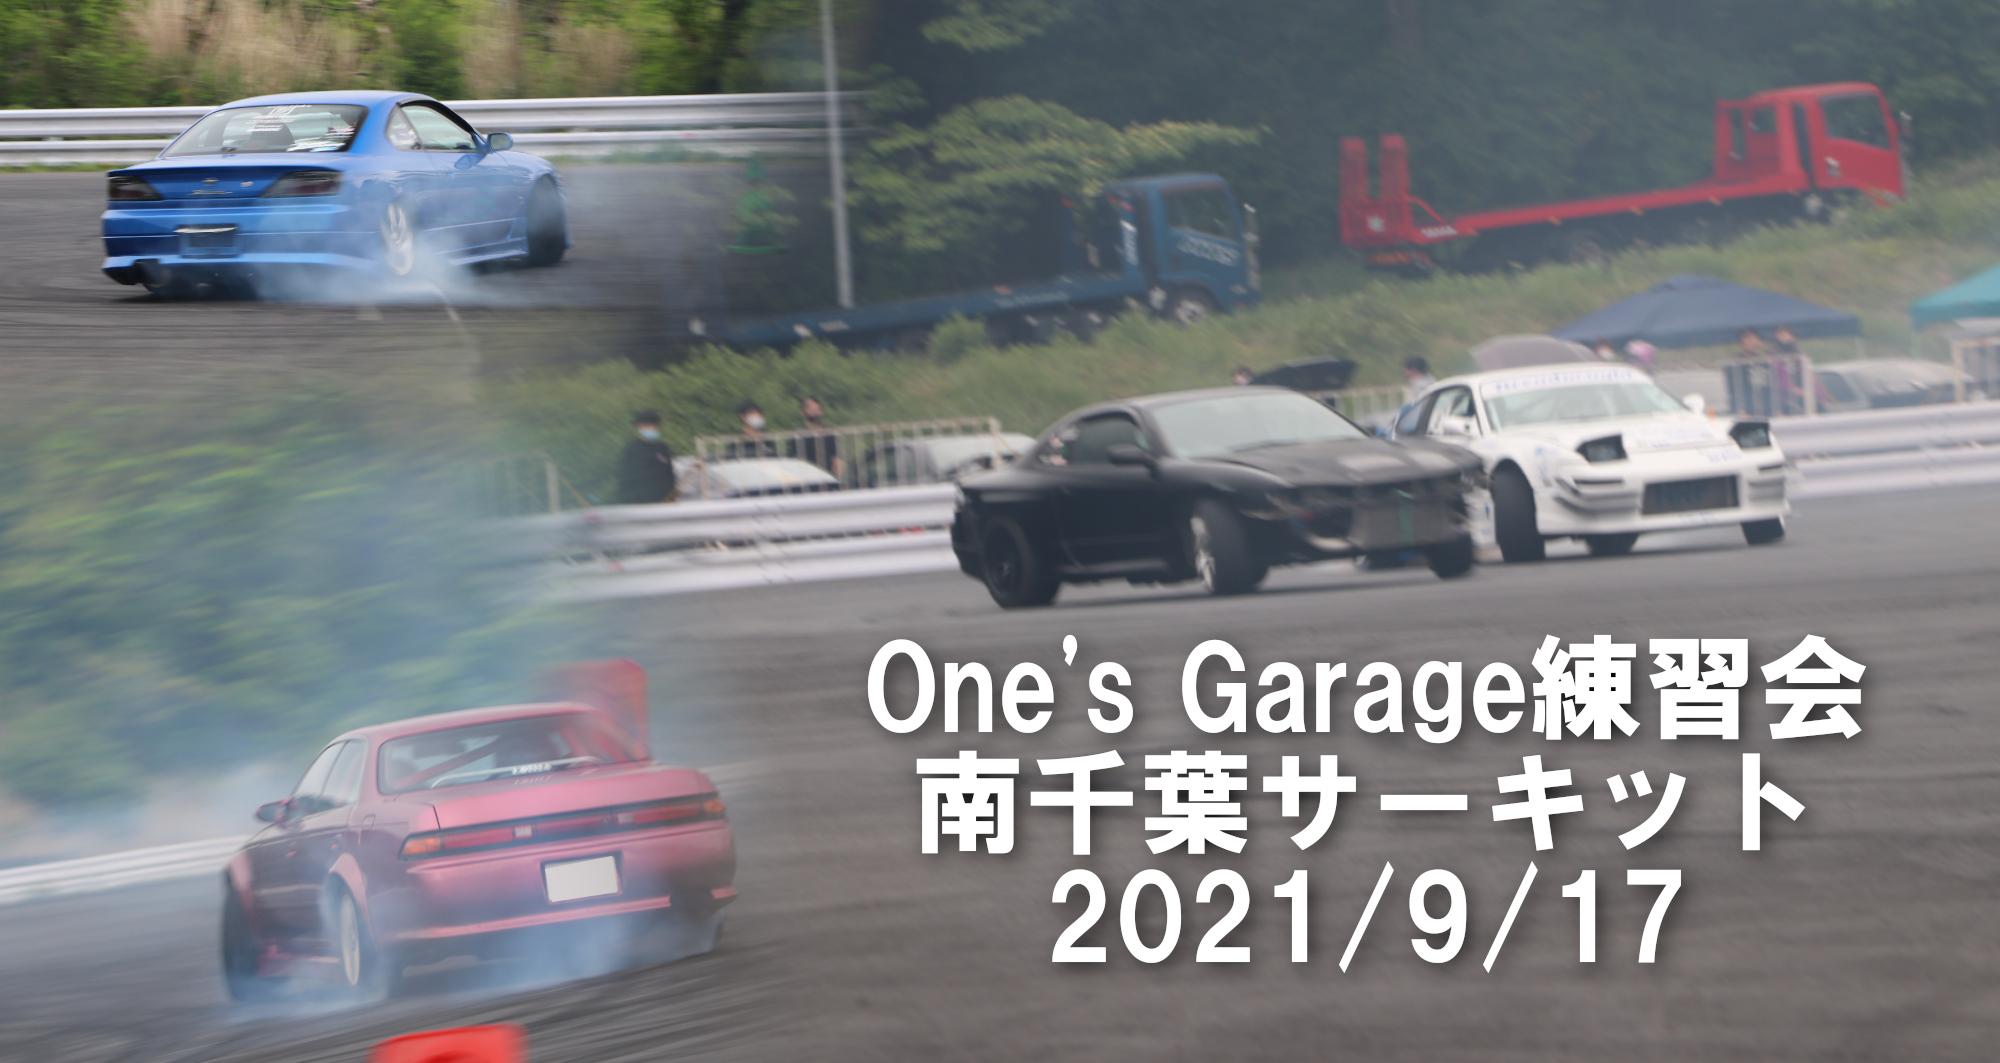 20210917One'sGarage走行会南千葉サーキット